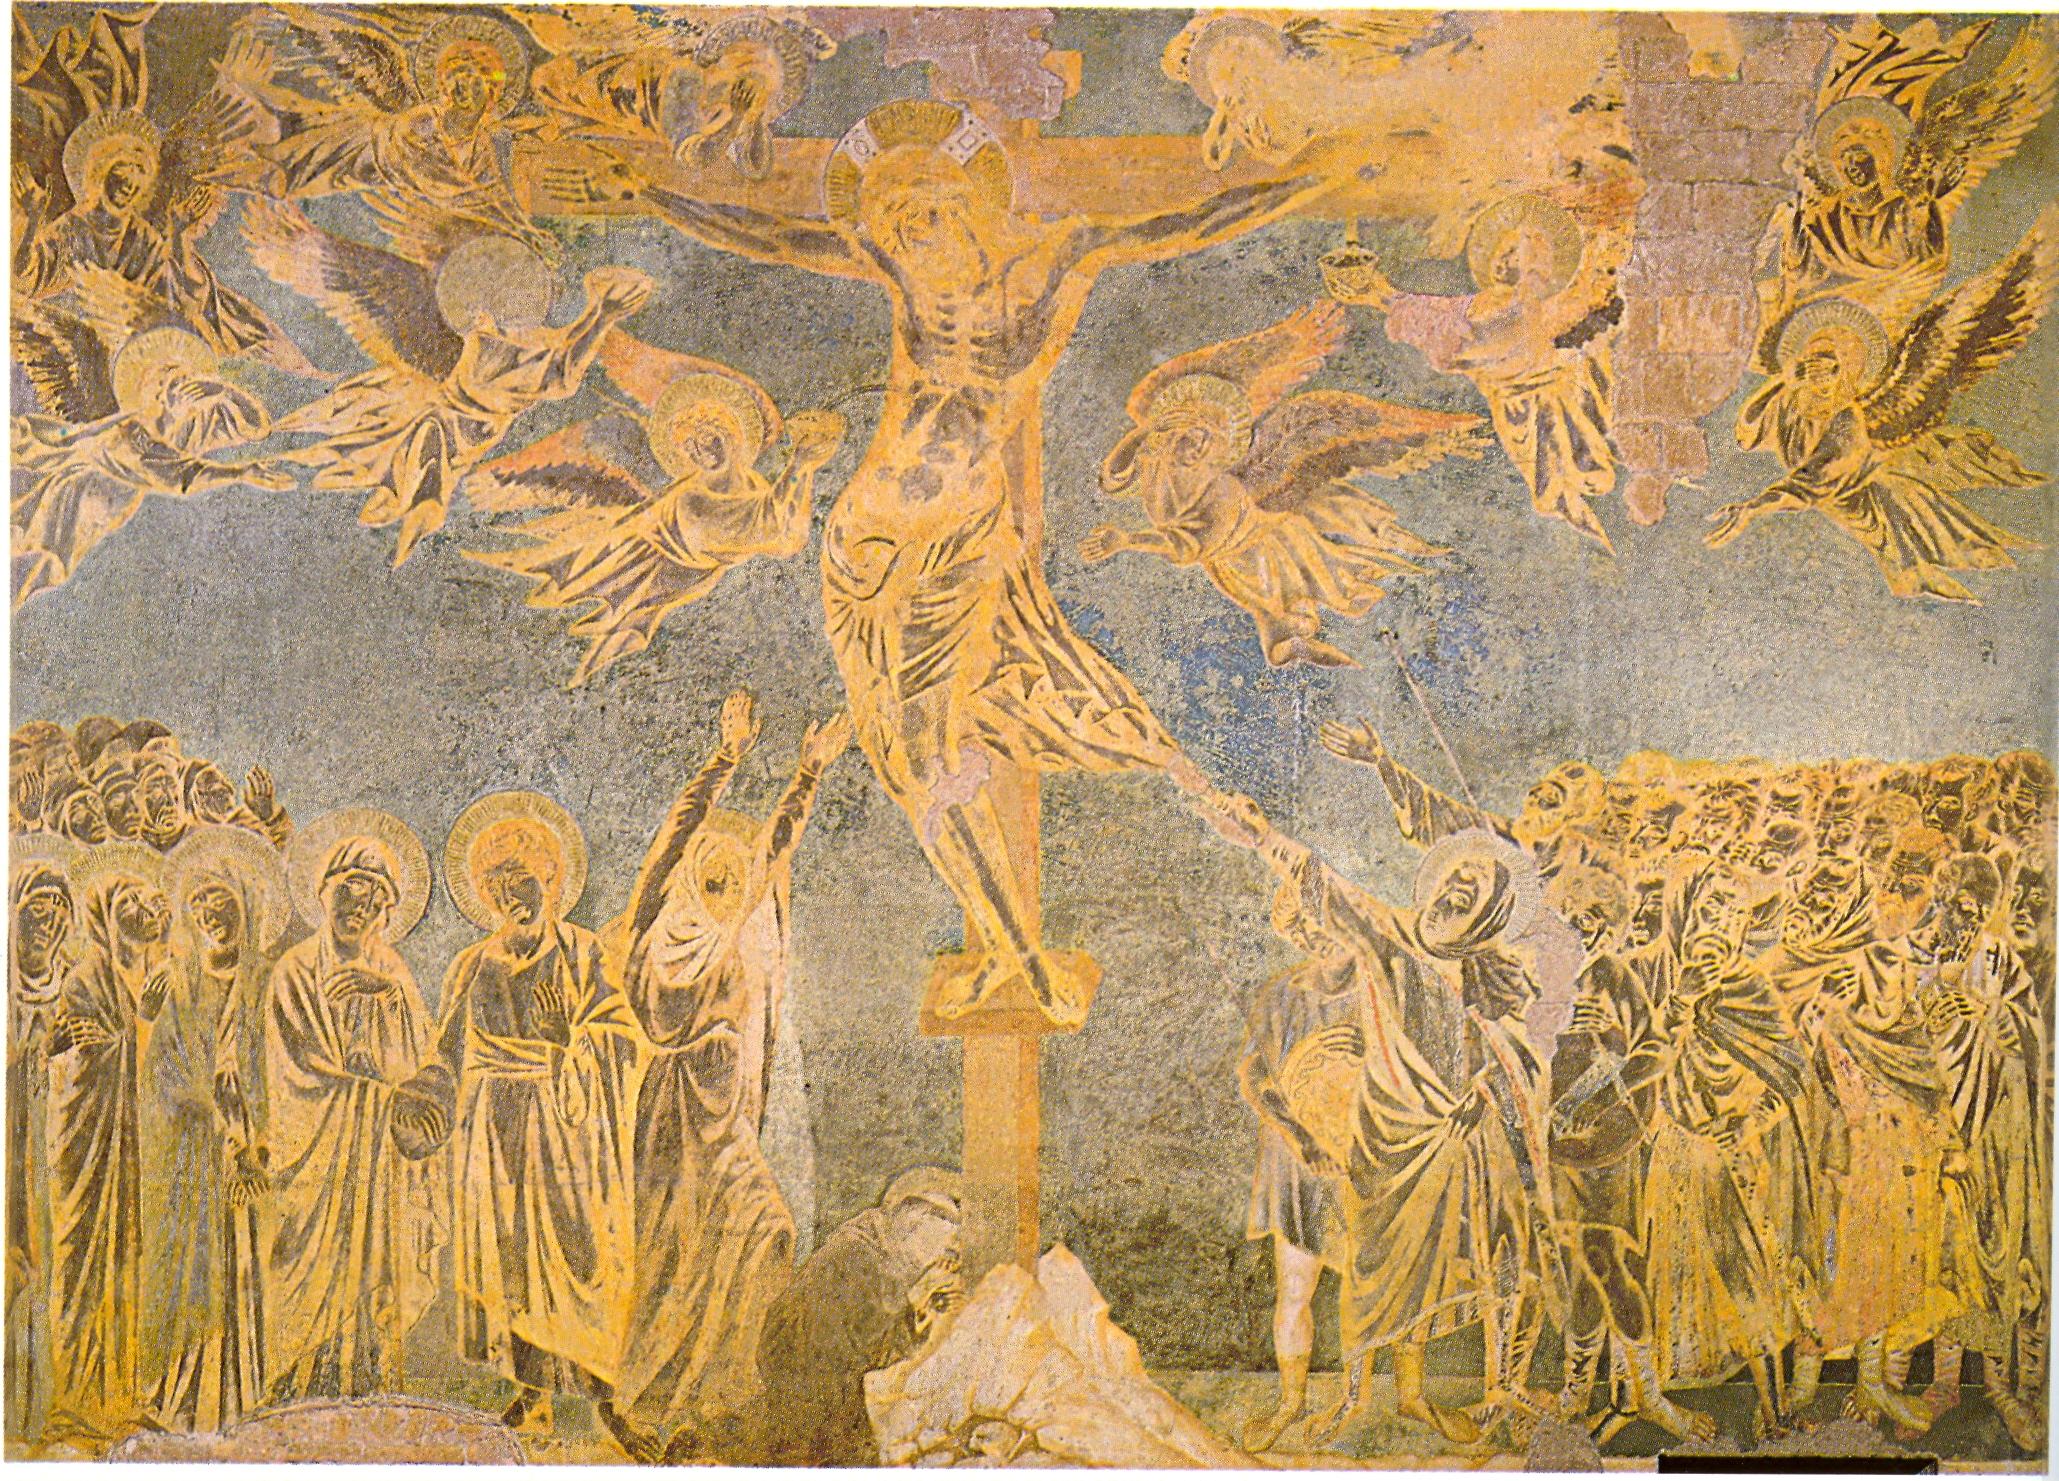 San Francesco d'Assisi Cimabue